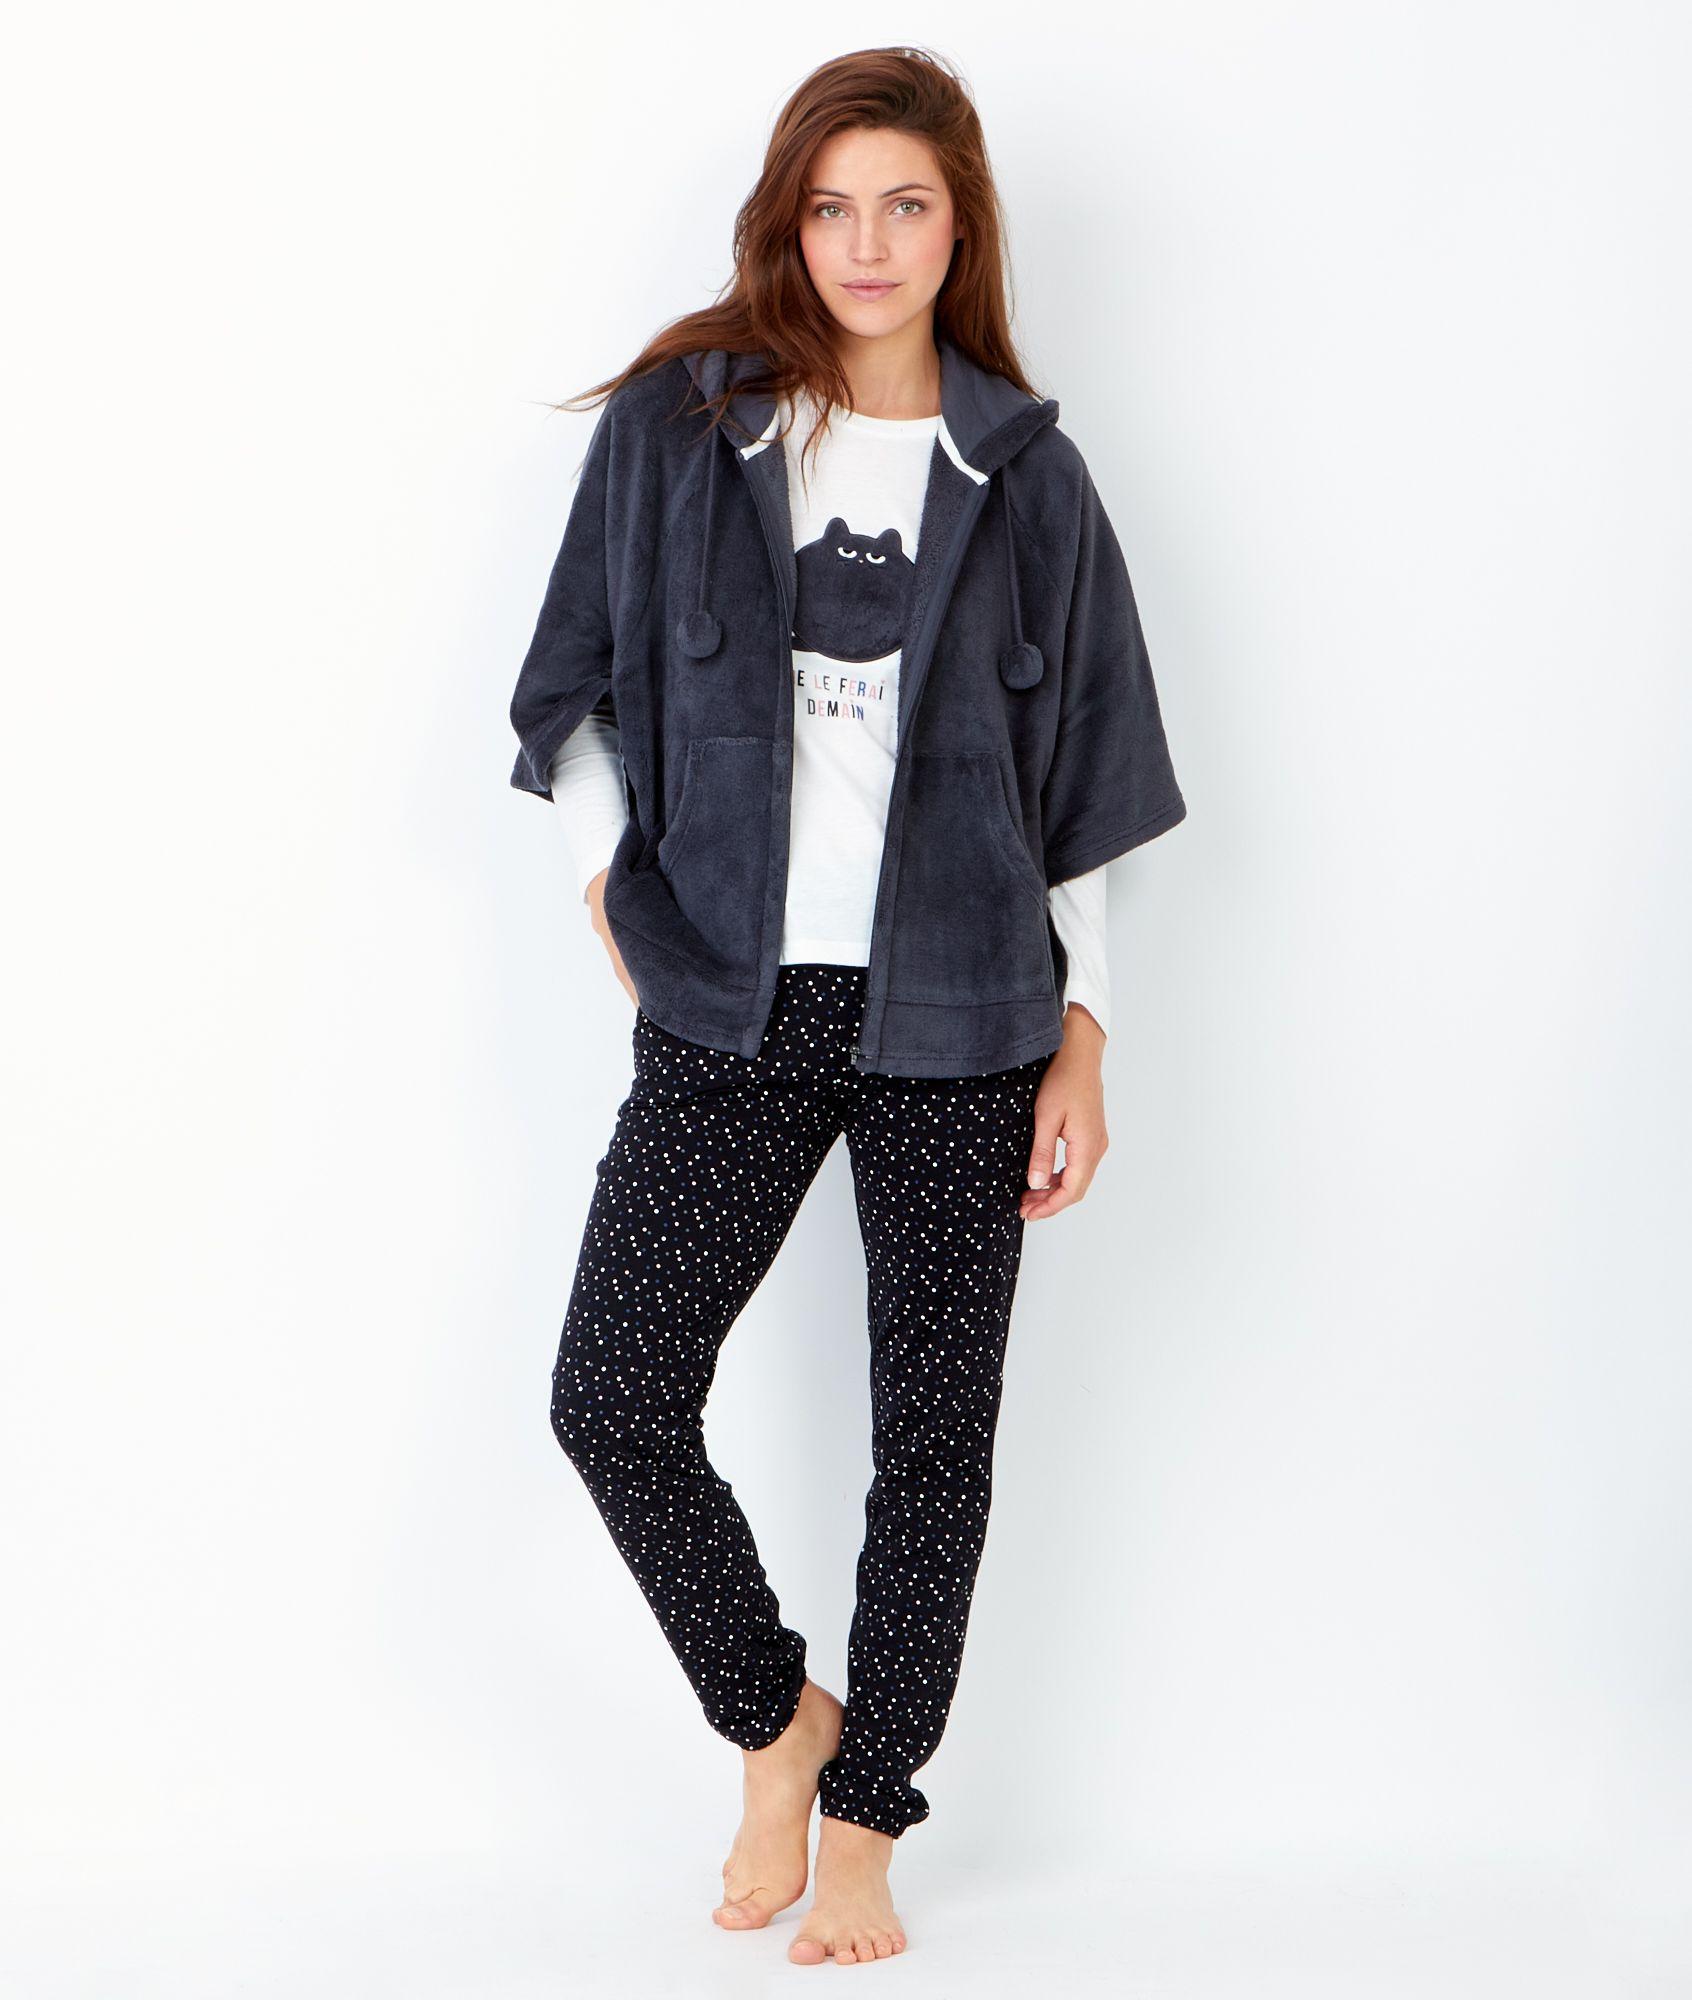 pyjama 3 pi ces veste toucher polaire pyjama. Black Bedroom Furniture Sets. Home Design Ideas